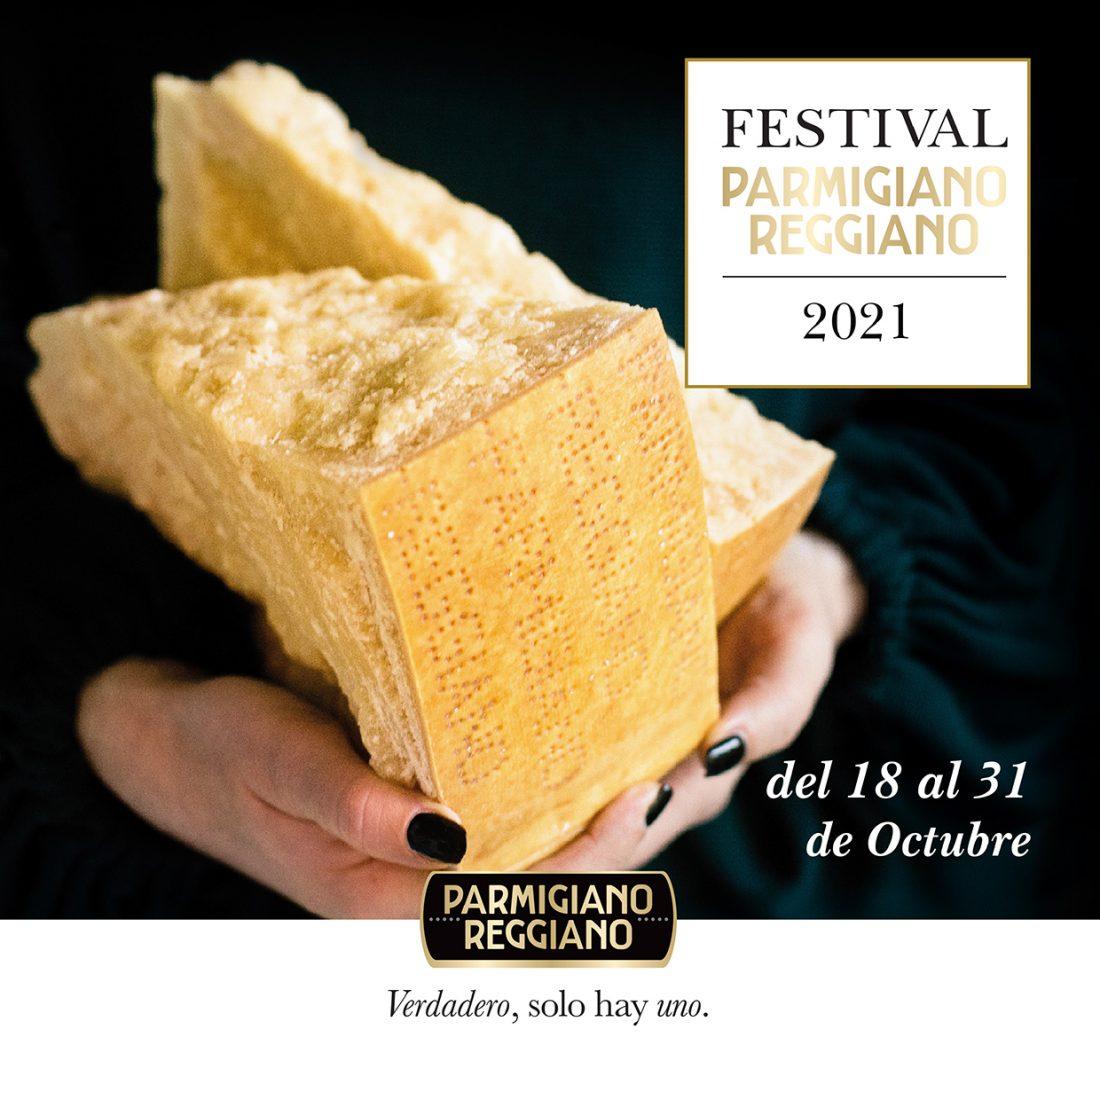 Festival Parmigiano Reggiano